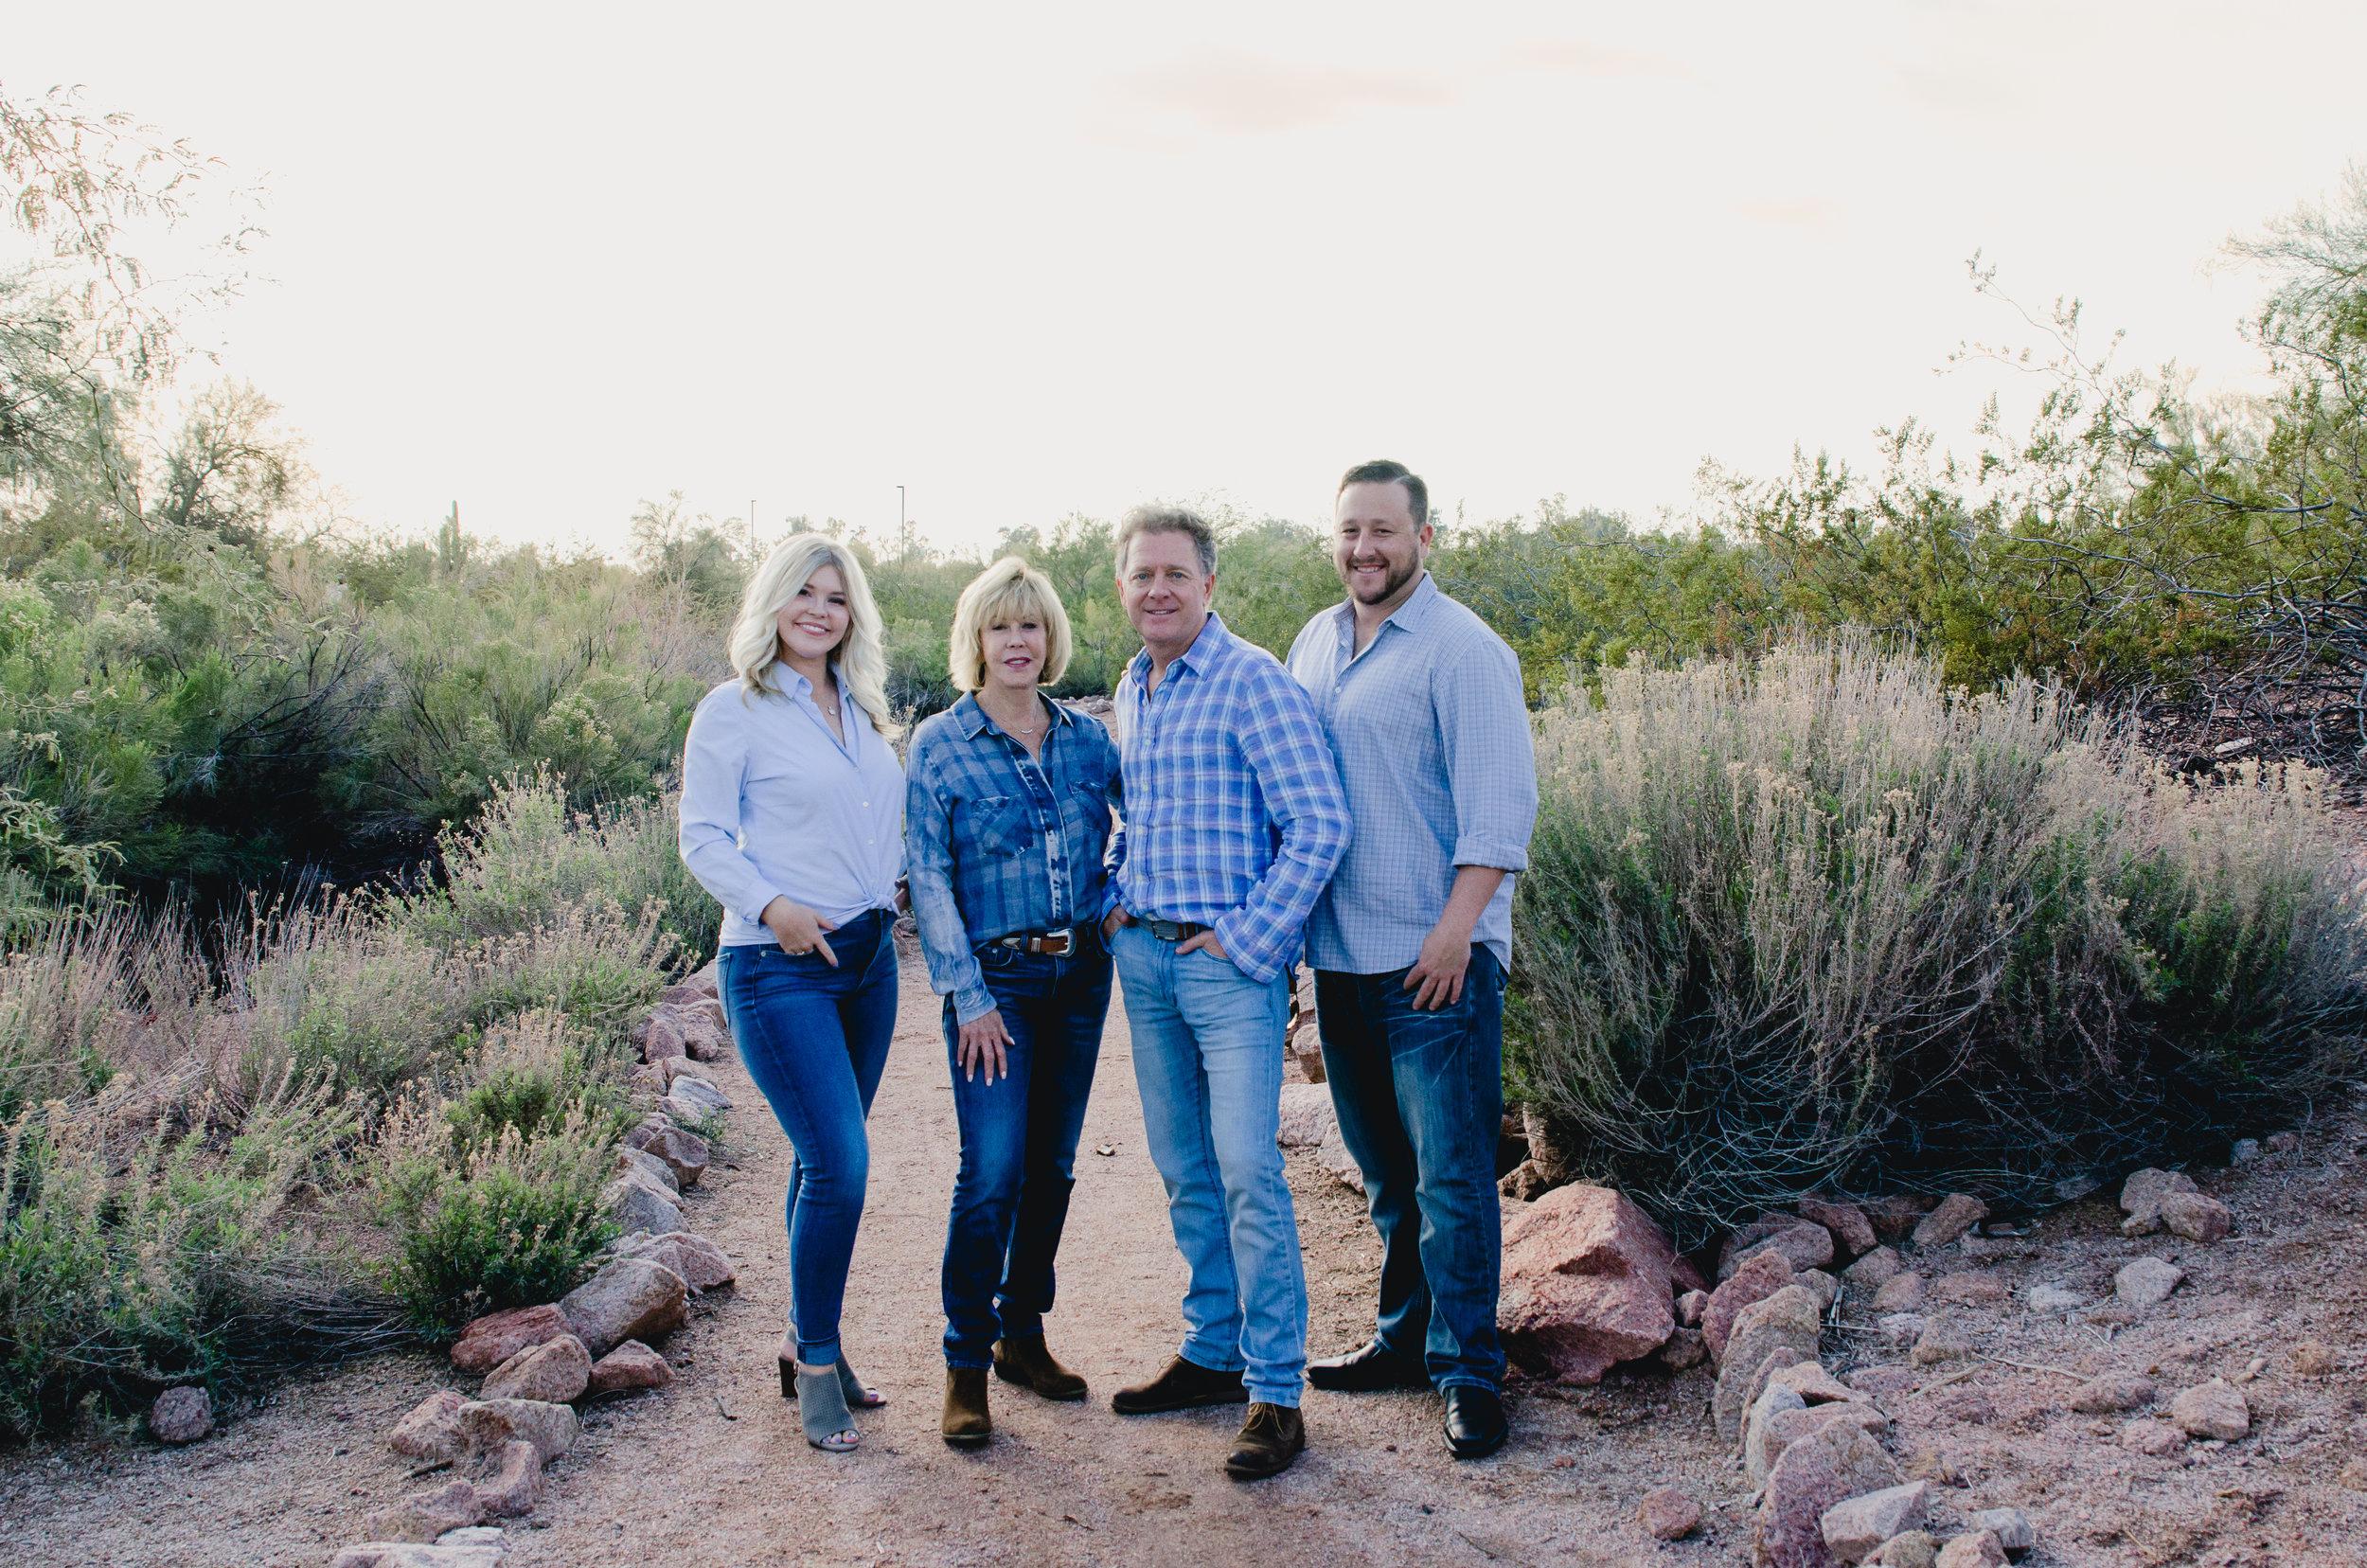 Scottsdale, AZ Family Session - Light & Airy Photographer - Papago Park